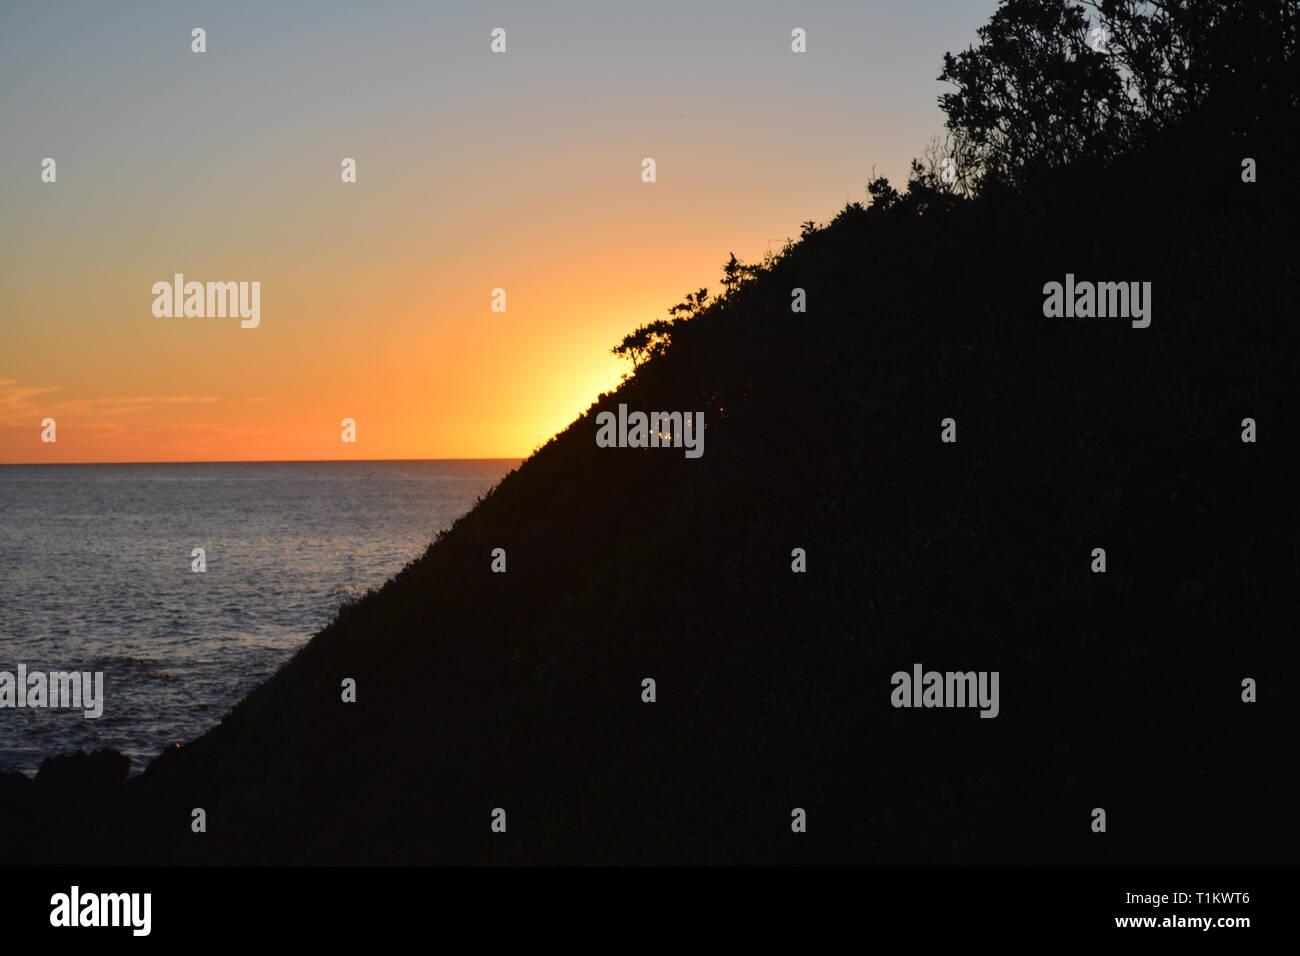 Sunrise over Pacific Ocean from Sawtell Australia - Stock Image